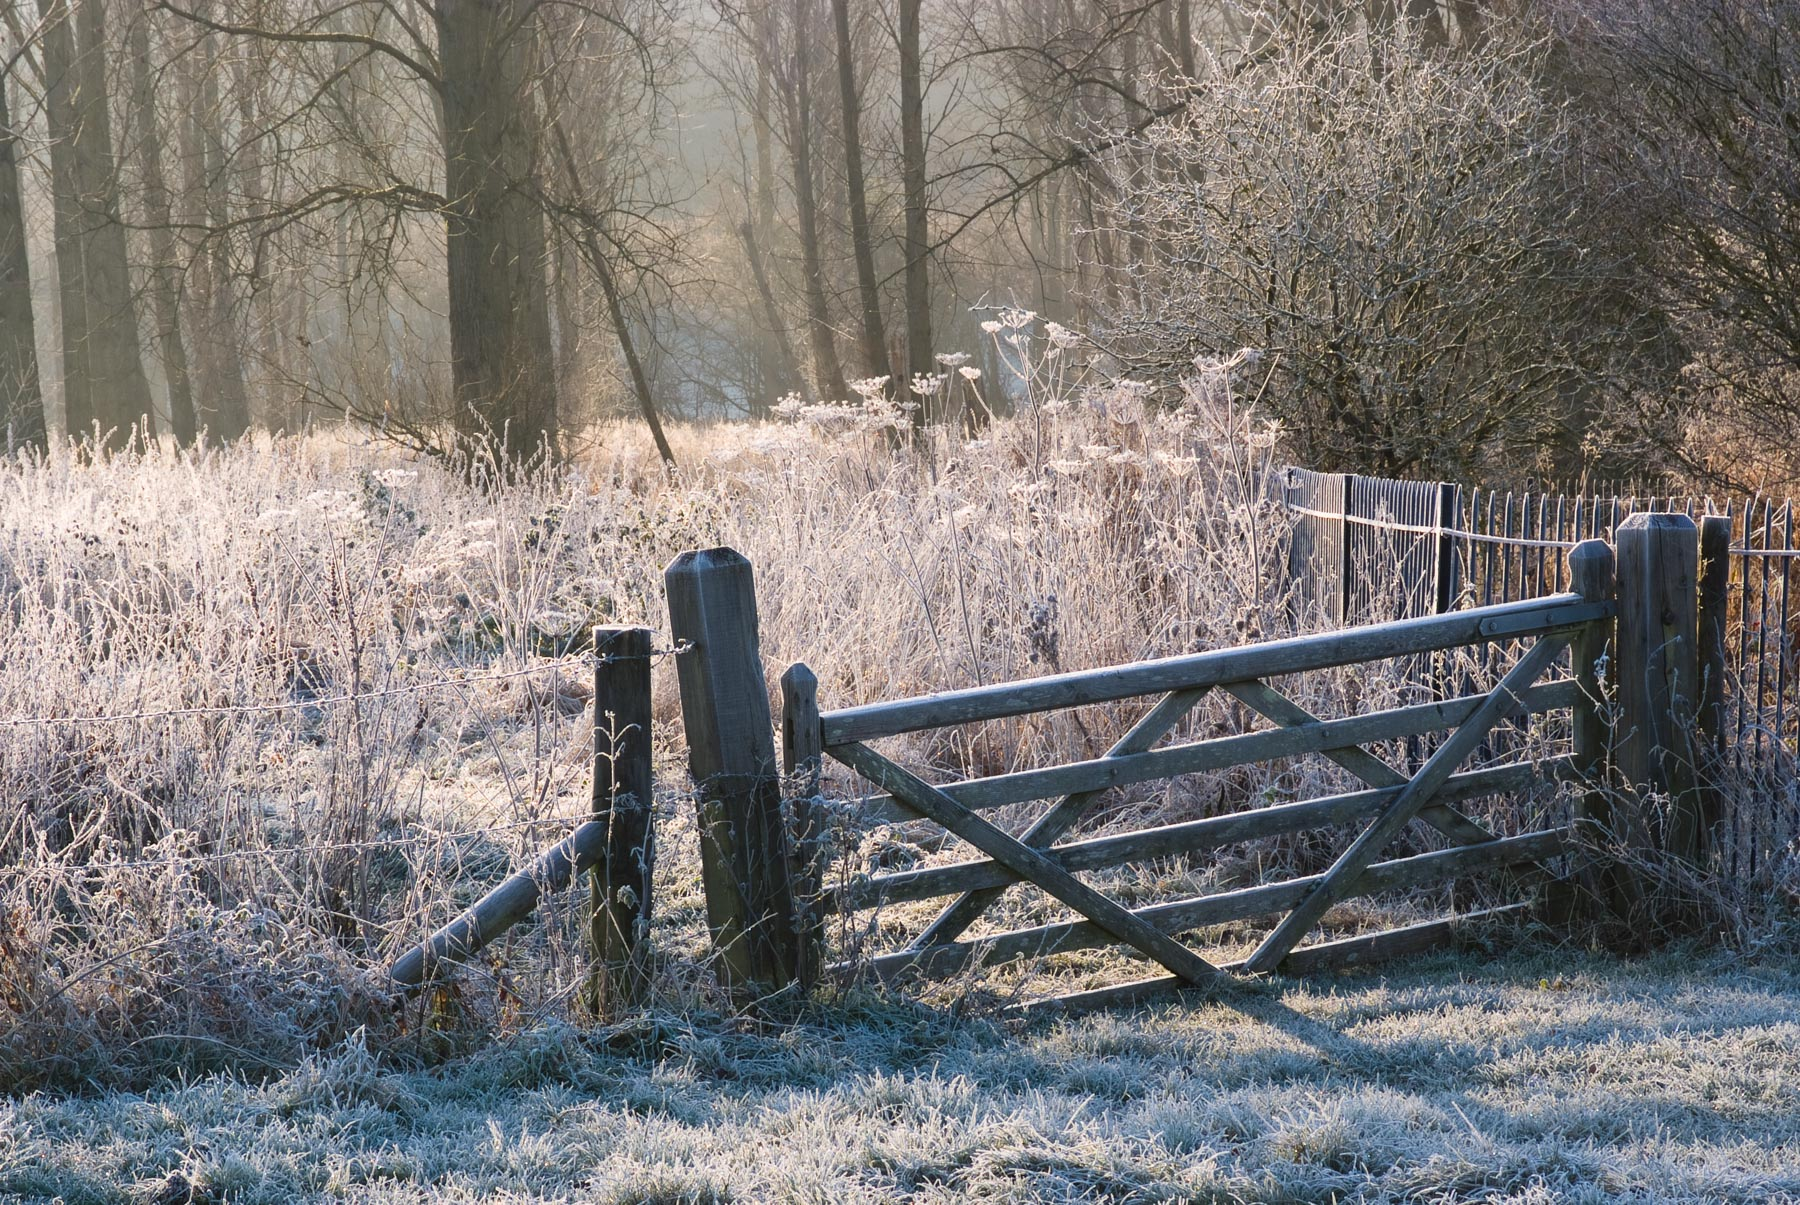 Frosty Gate, Minster Lovell, Nikon D700, Nikkor 28 - 105mm at 80mm, ISO 100, 1/13s at f/13, Tripod. January. © Sarah Howard